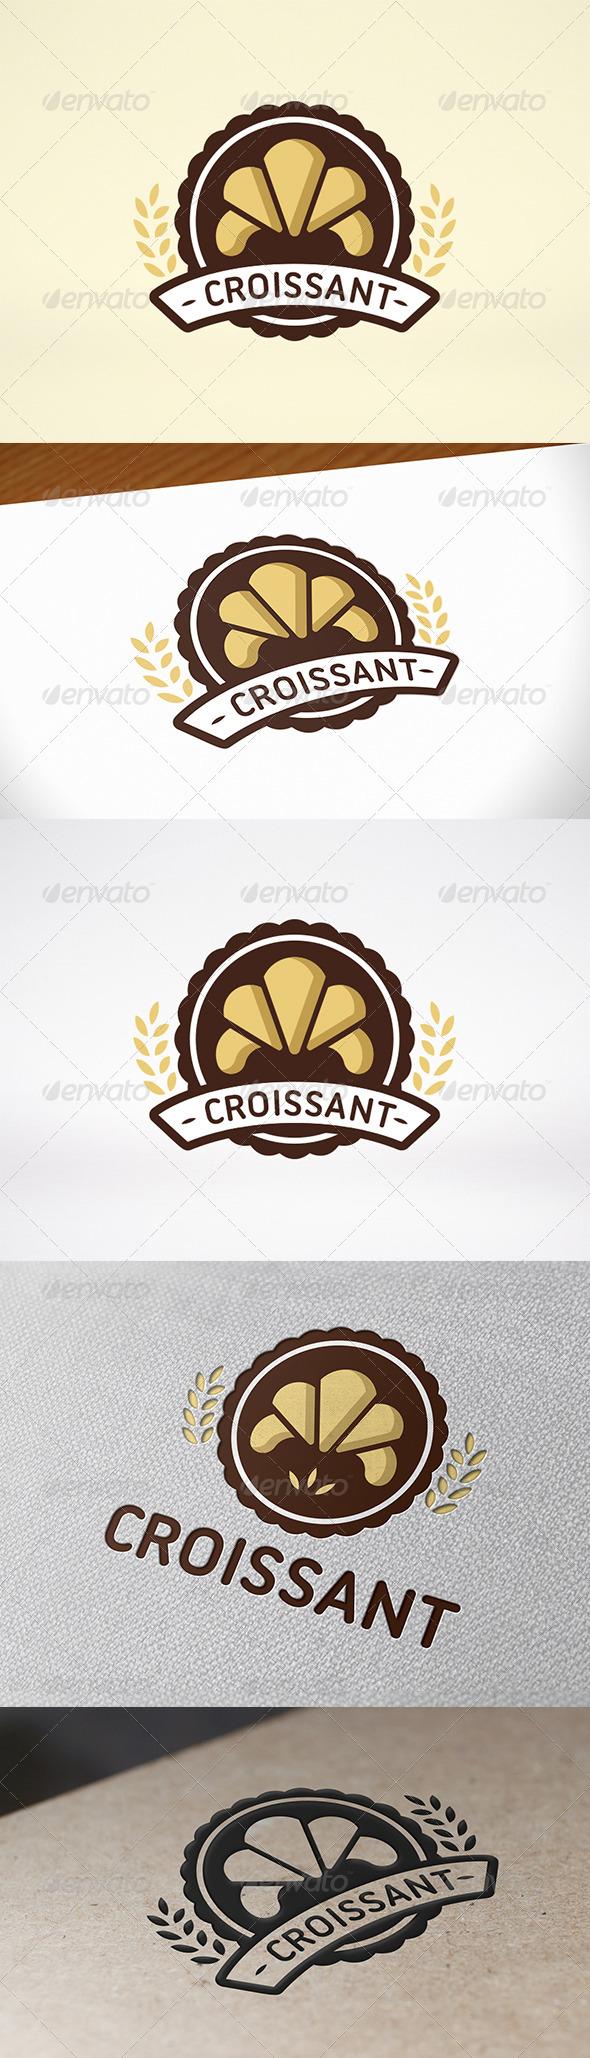 Bakery Logo Template - Food Logo Templates